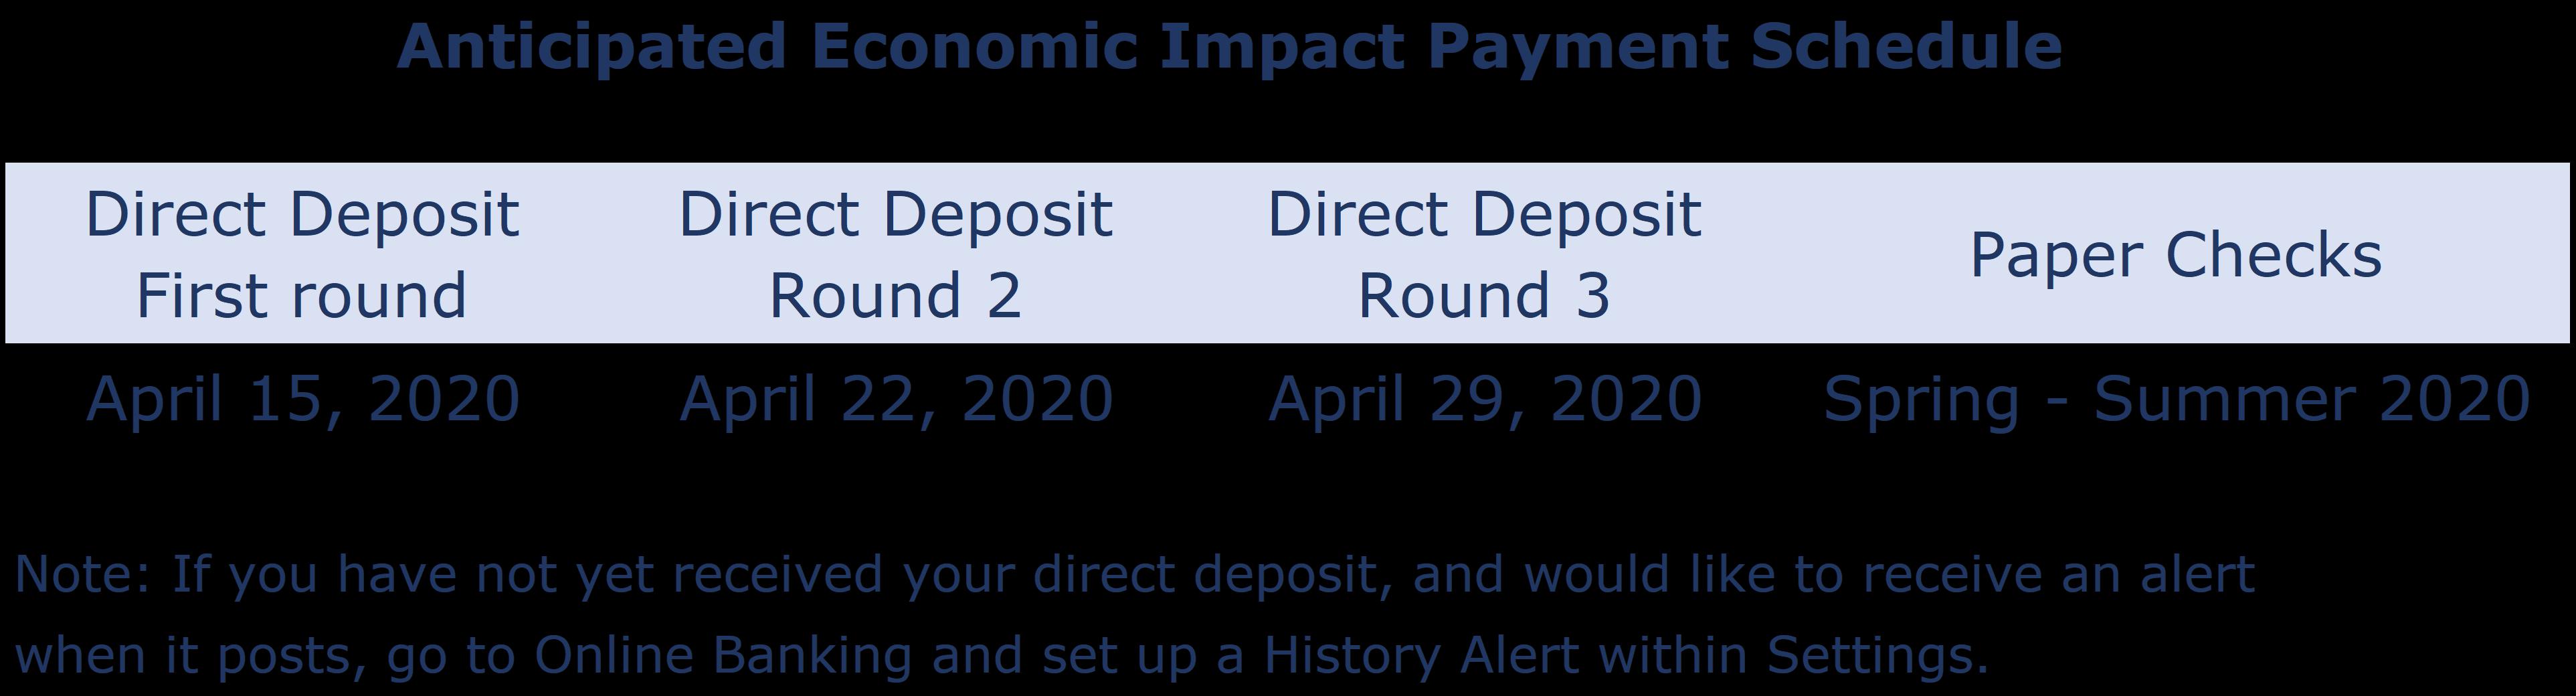 COVID-19 Economic Impact Payment Schedule